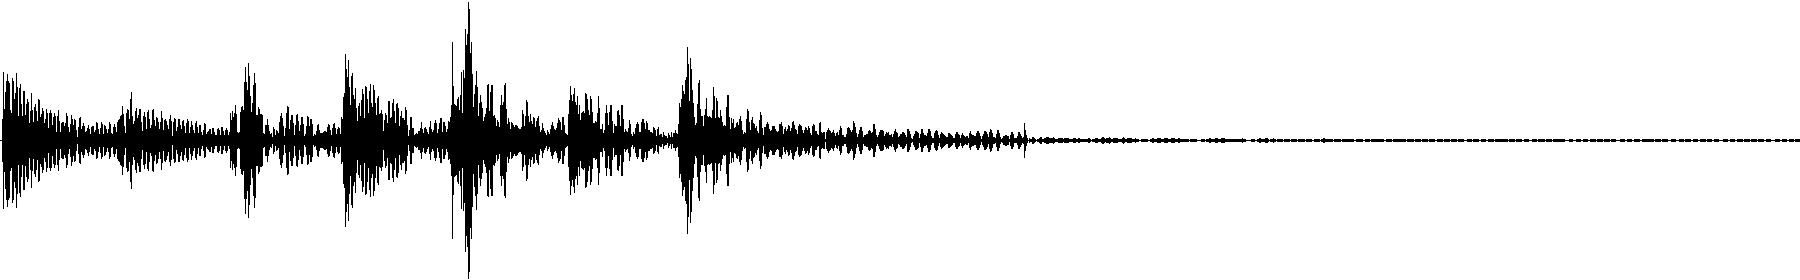 sfj 130 bpm drum fill 02